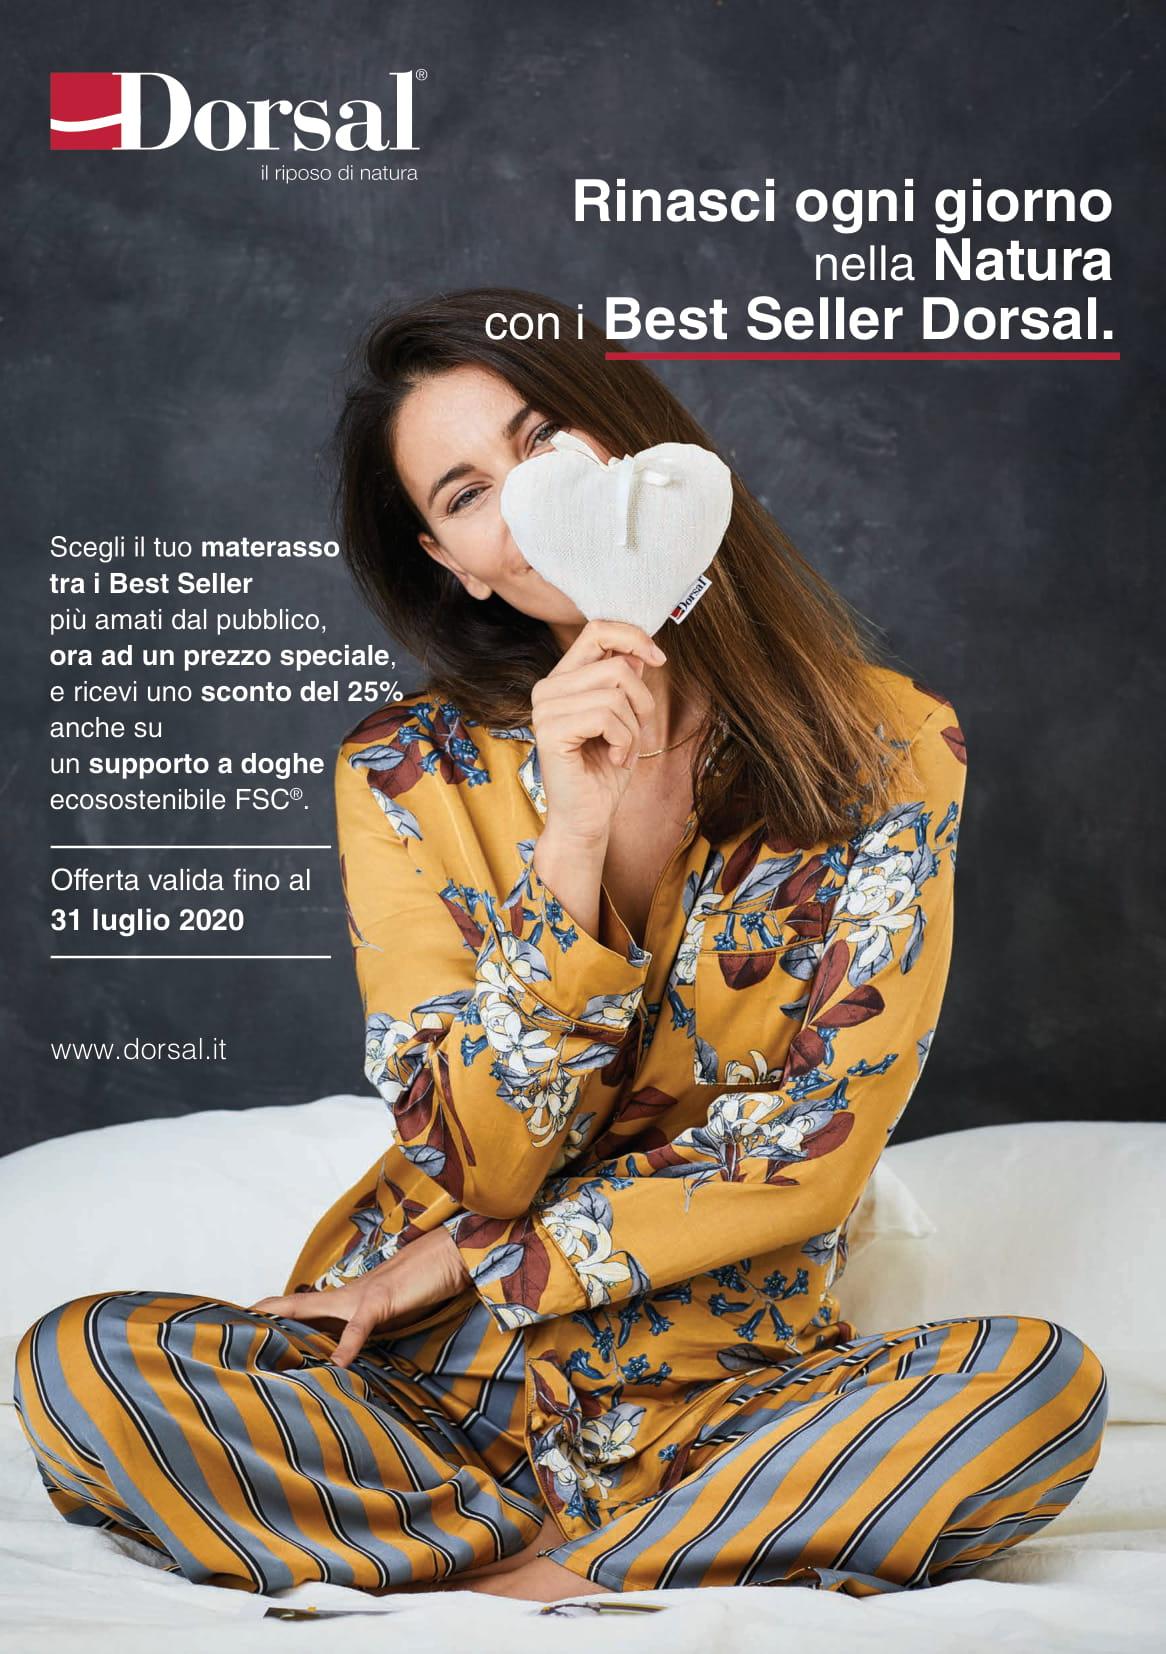 Promo Dorsal estate 2020